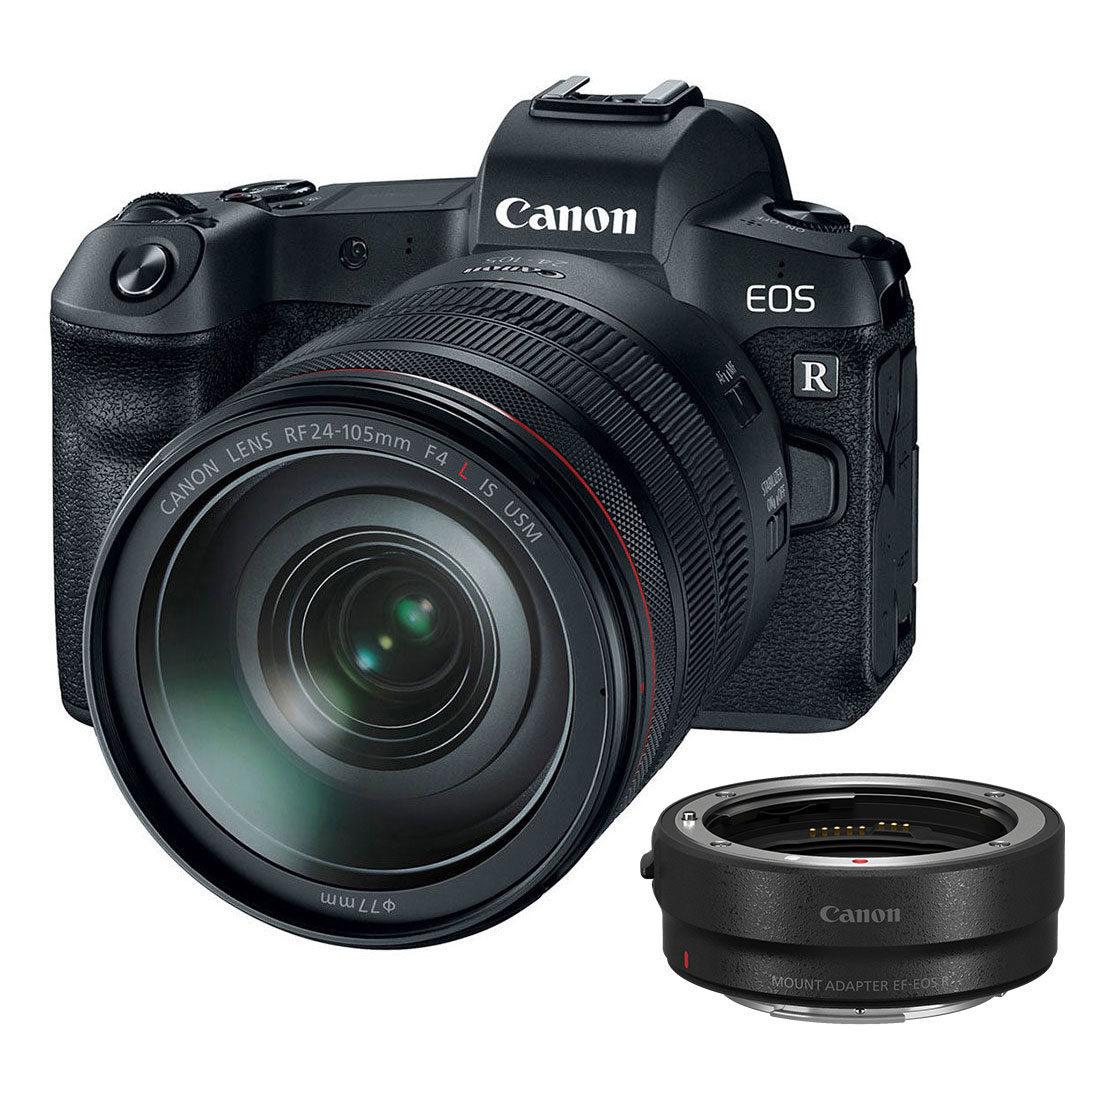 Canon EOS R systeemcamera Zwart + RF 24-105mm f/4.0L + EF-adapter open-box <br/>€ 2499.00 <br/> <a href='https://www.cameranu.nl/fotografie/?tt=12190_474631_241358_&r=https%3A%2F%2Fwww.cameranu.nl%2Fnl%2Fp2975155%2Fcanon-eos-r-systeemcamera-zwart-rf-24-105mm-f-4-0l-ef-adapter-open-box%3Fchannable%3De10841.Mjk3NTE1NQ%26utm_campaign%3D%26utm_content%3DEOS%2BR%2Bsysteemcamera%26utm_source%3DTradetracker%26utm_medium%3Dcpc%26utm_term%3DDigitale%2Bcamera%26apos%3Bs' target='_blank'>naar de winkel</a>